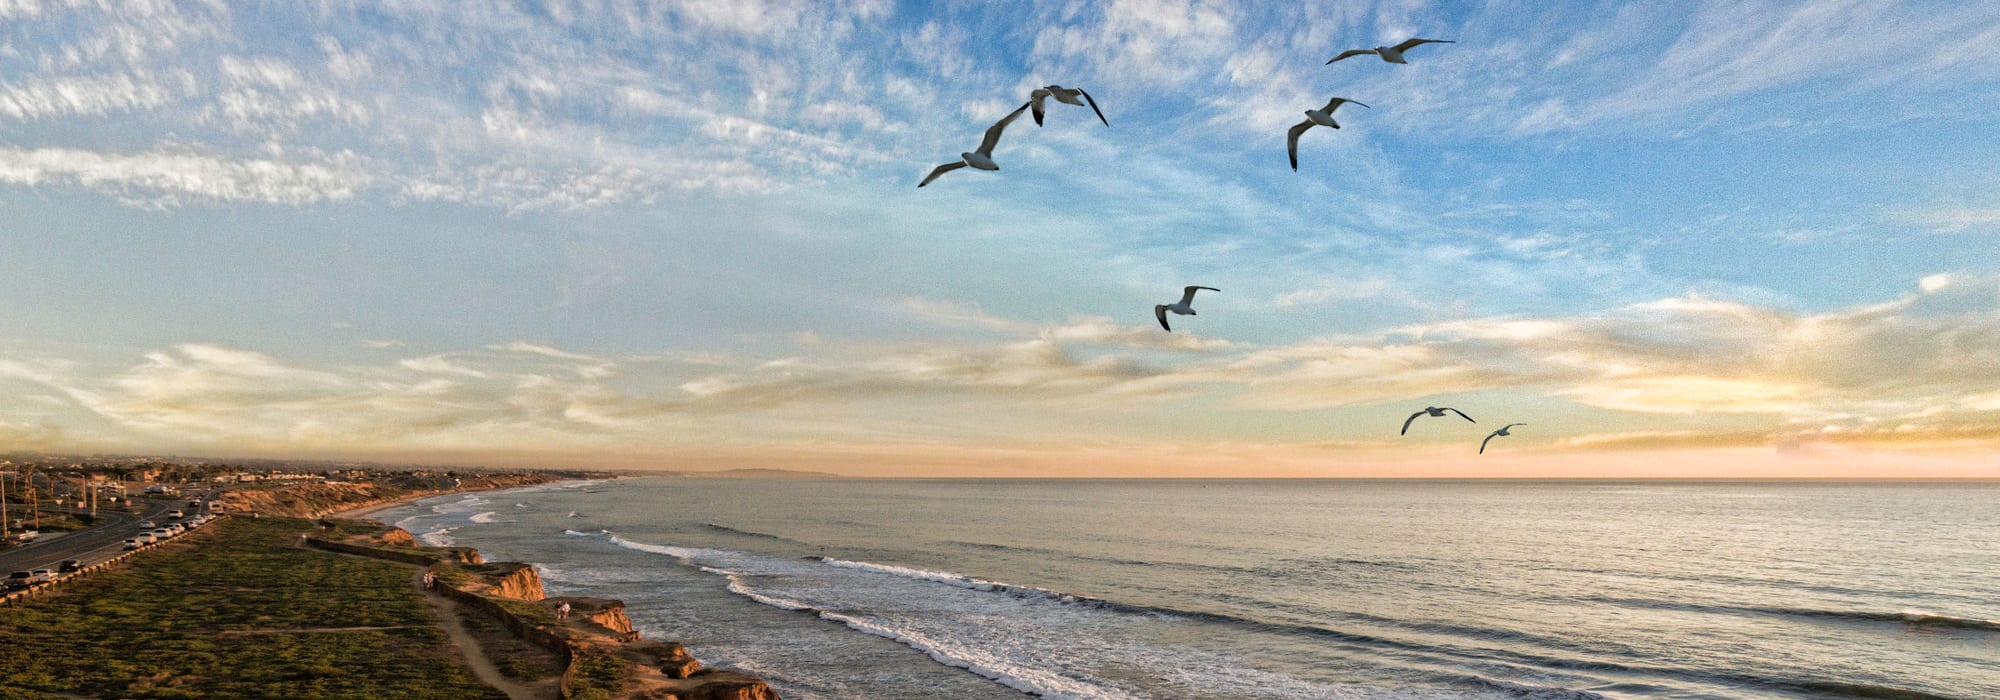 Sunset on the beach near Sorrento Valley Self Storage in San Diego, California